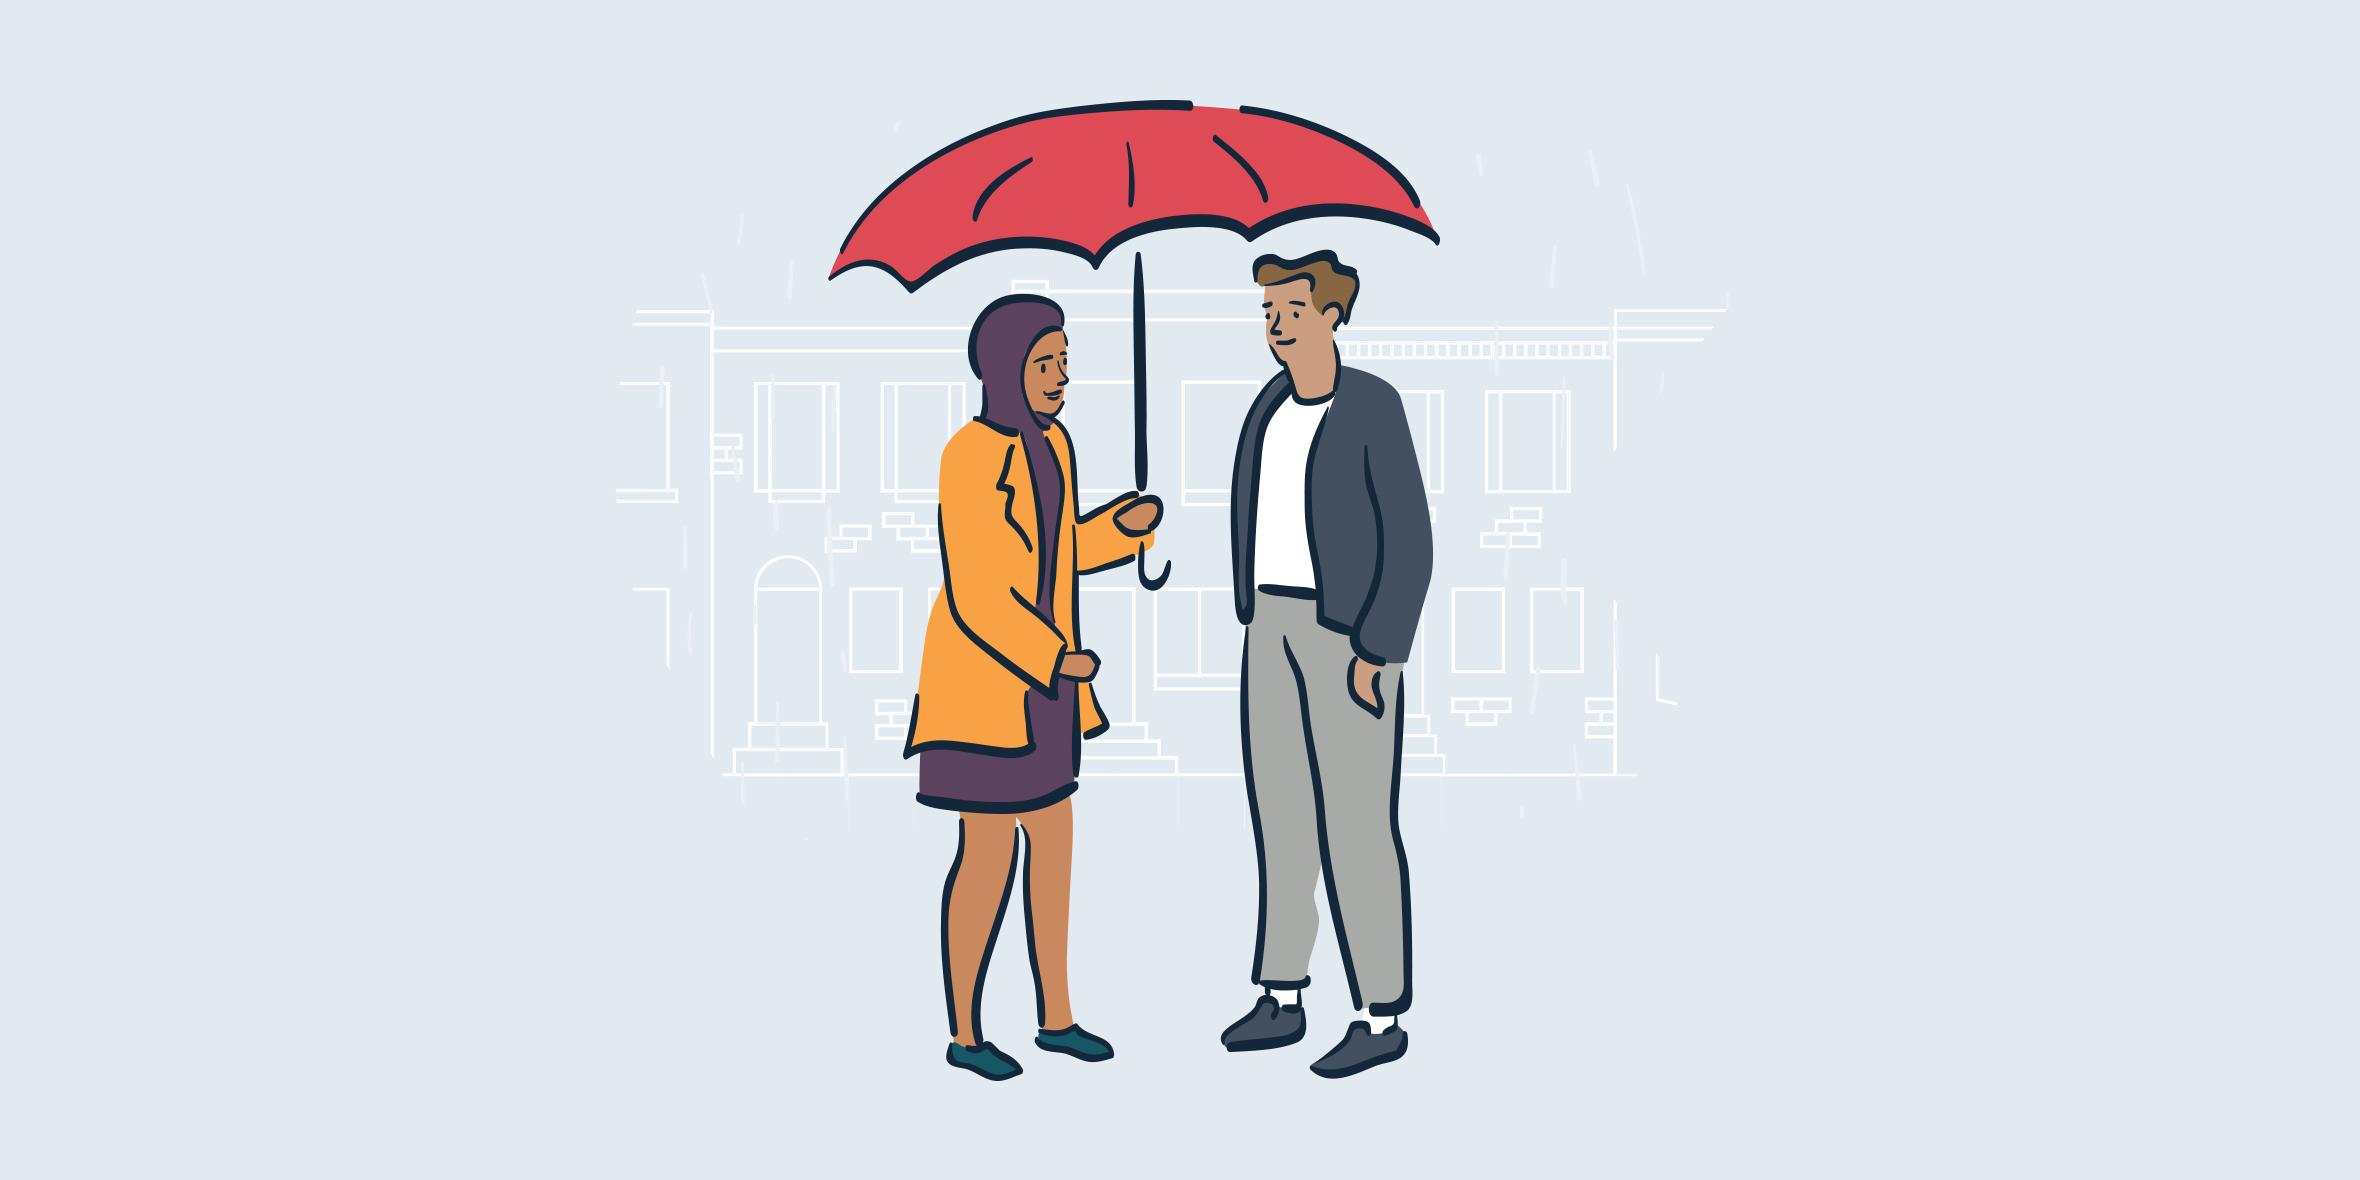 illustration of woman holding umbrella over man